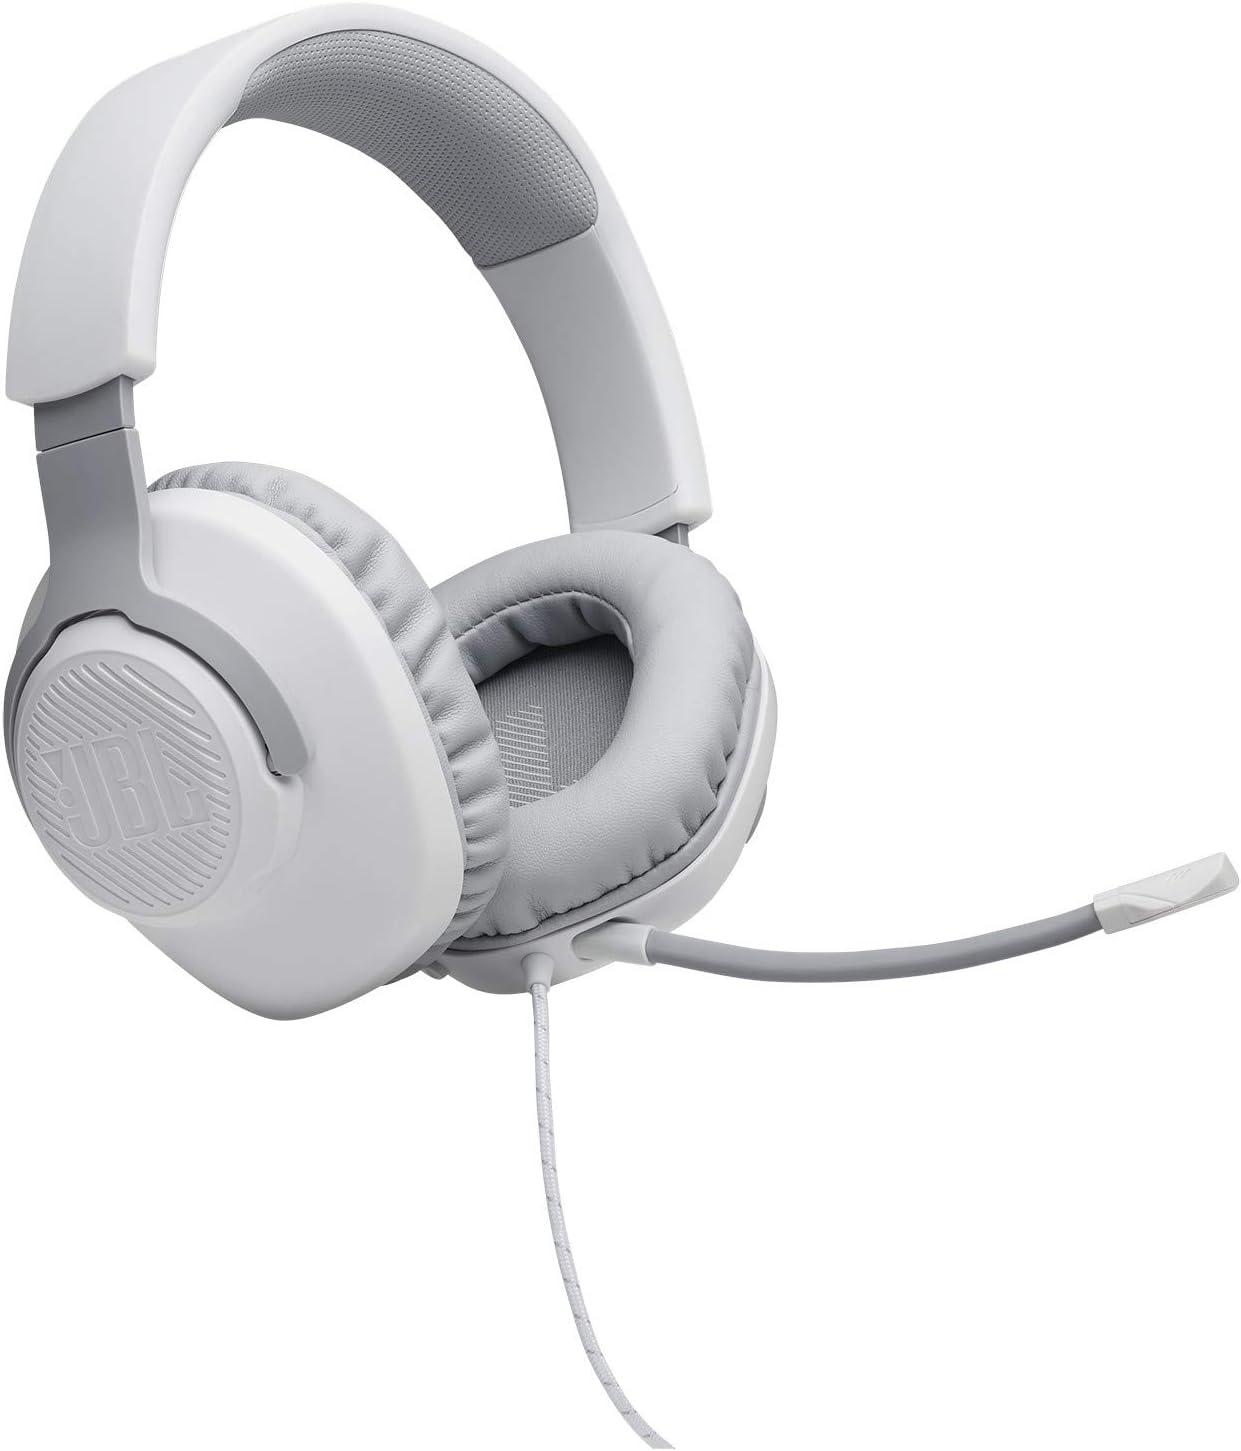 Auriculares Gamer Over Ear Jbl Quantum 100, blanco